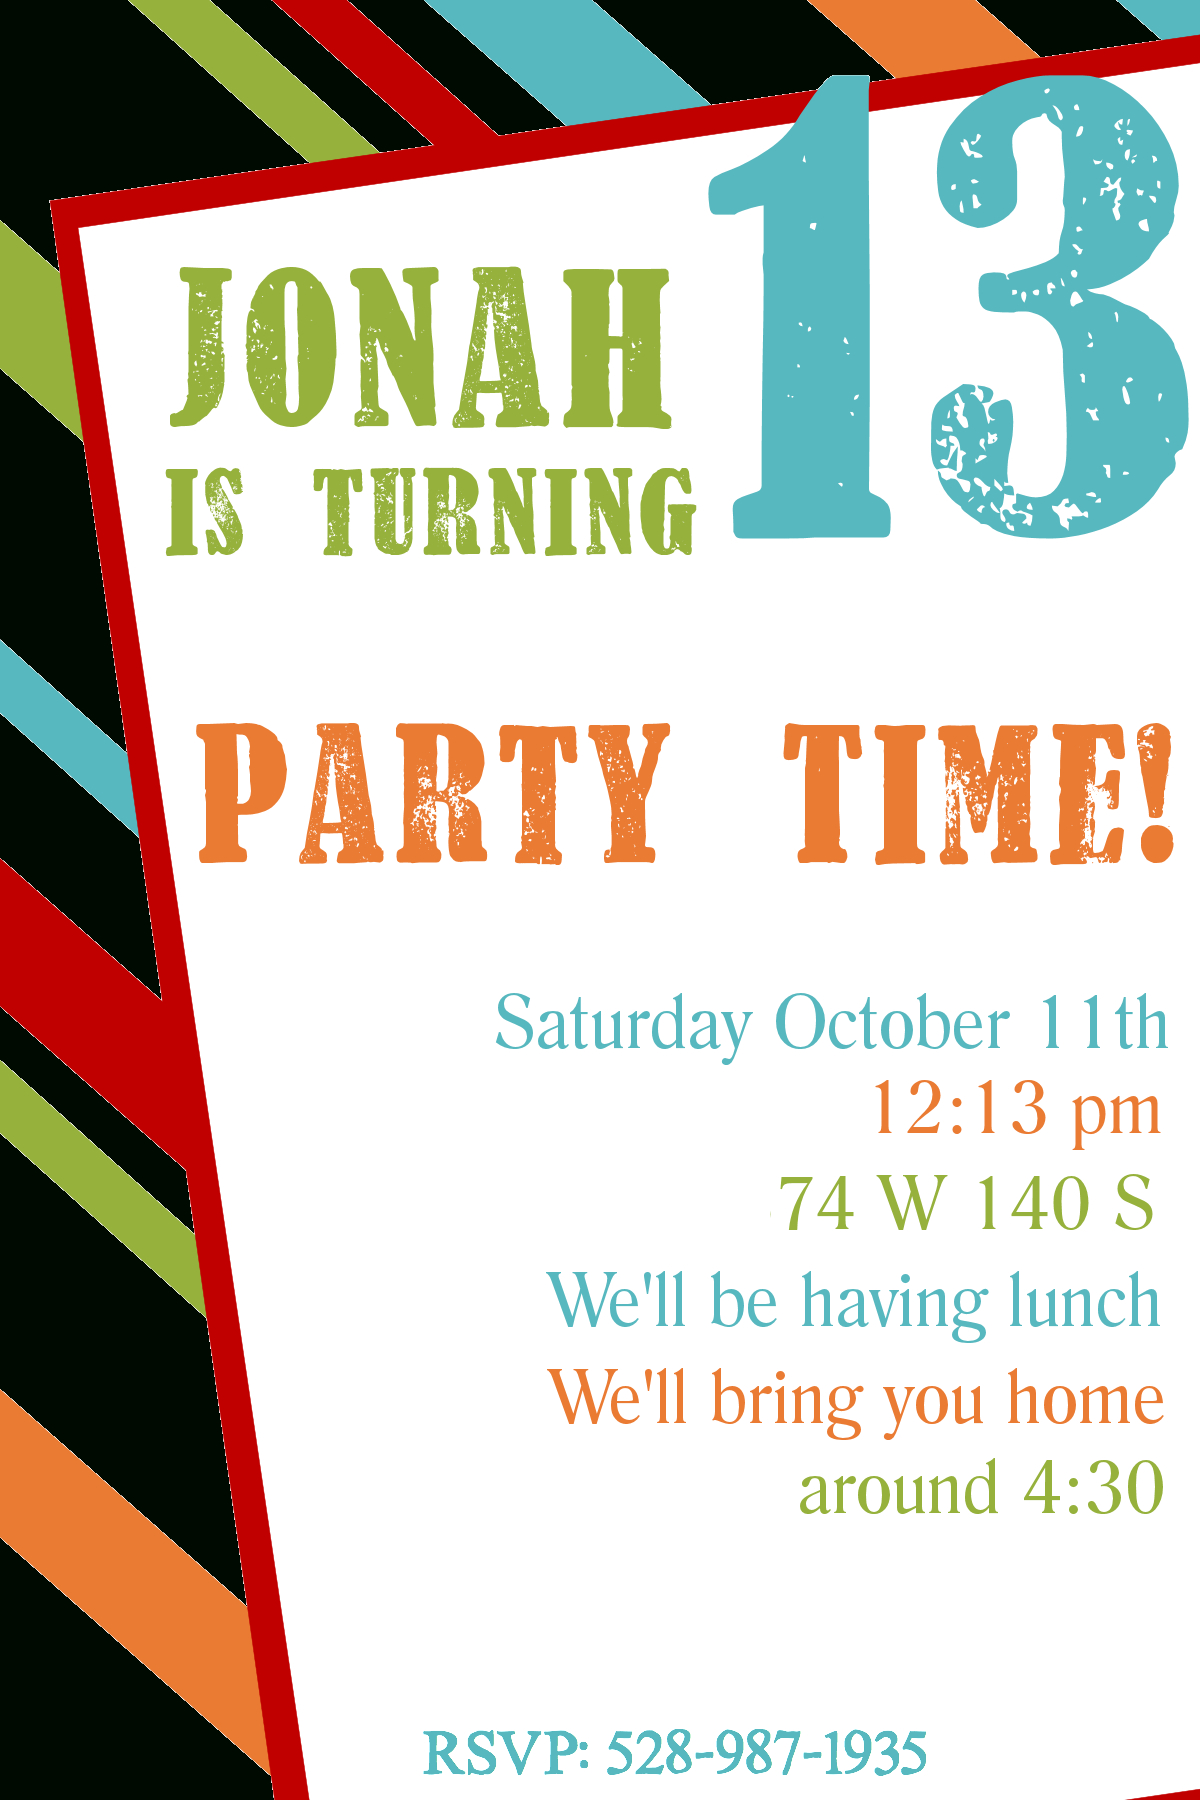 Free Printable Birthday Invitation Templates | Printables | Free - Free Printable Birthday Party Invitations